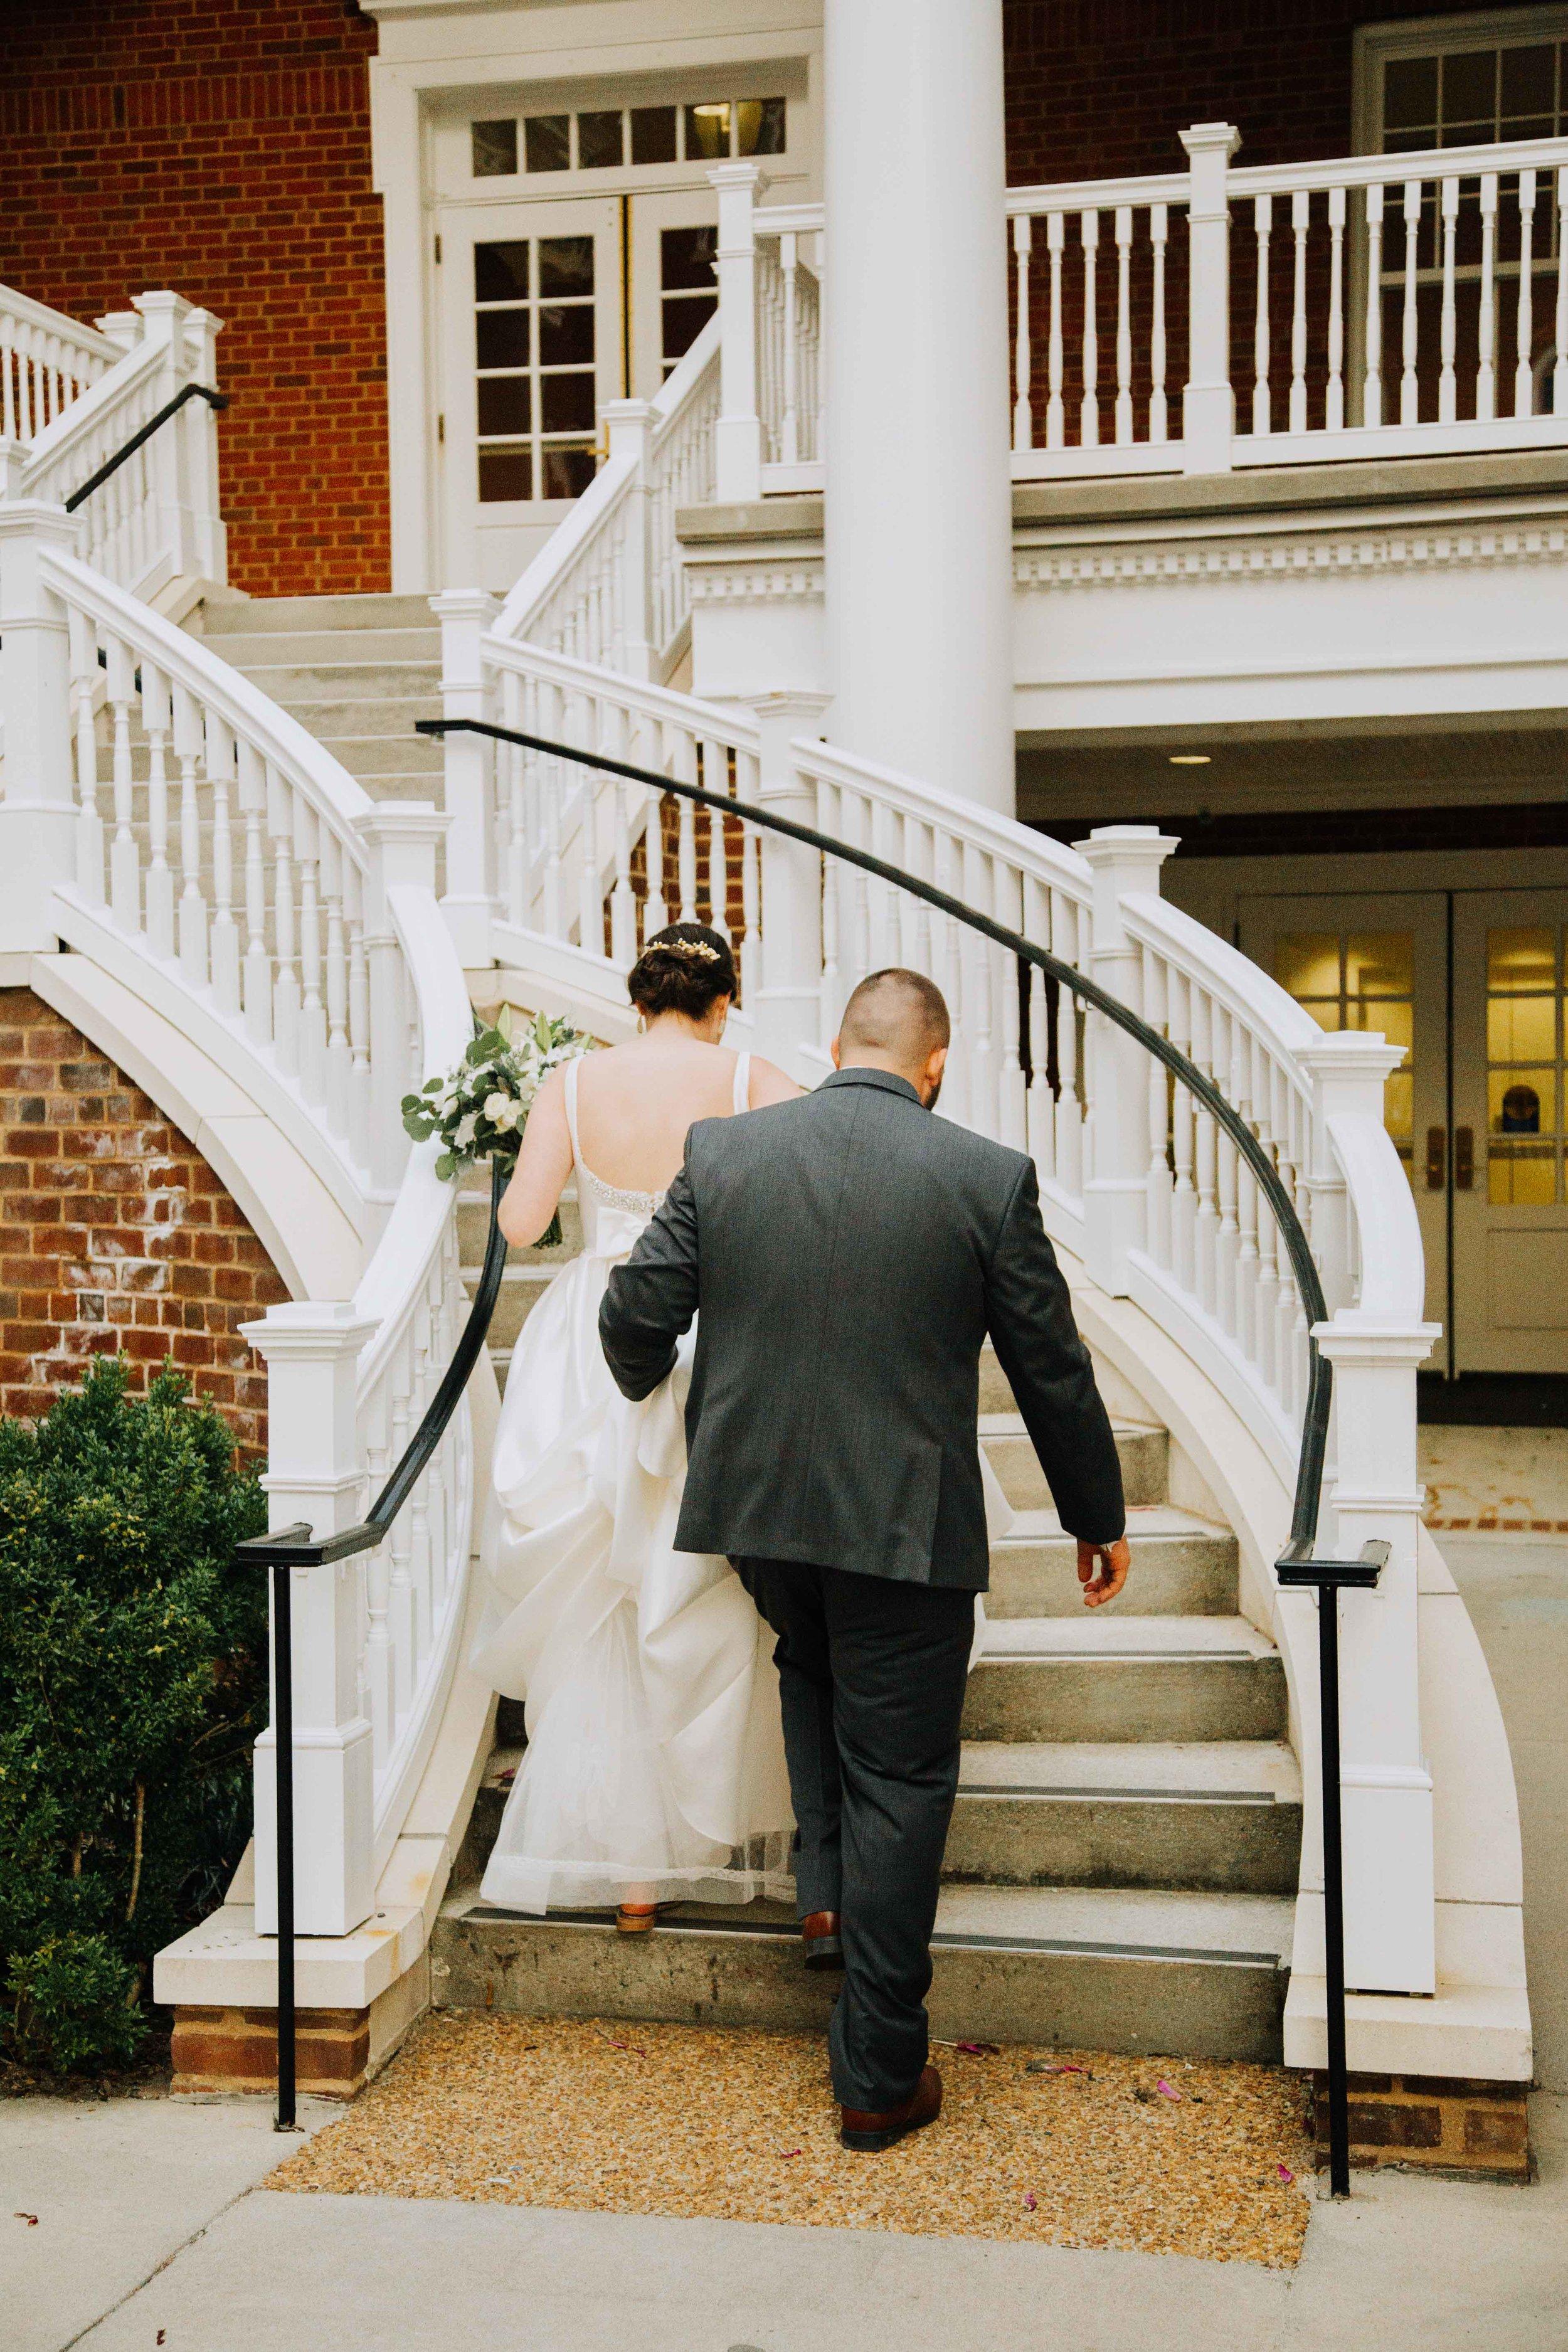 Farmville-Virginia-Wedding-Hotel-Weynoke-Downtown-Jacqueline-Waters-Photography-Detailed- (1283).jpg